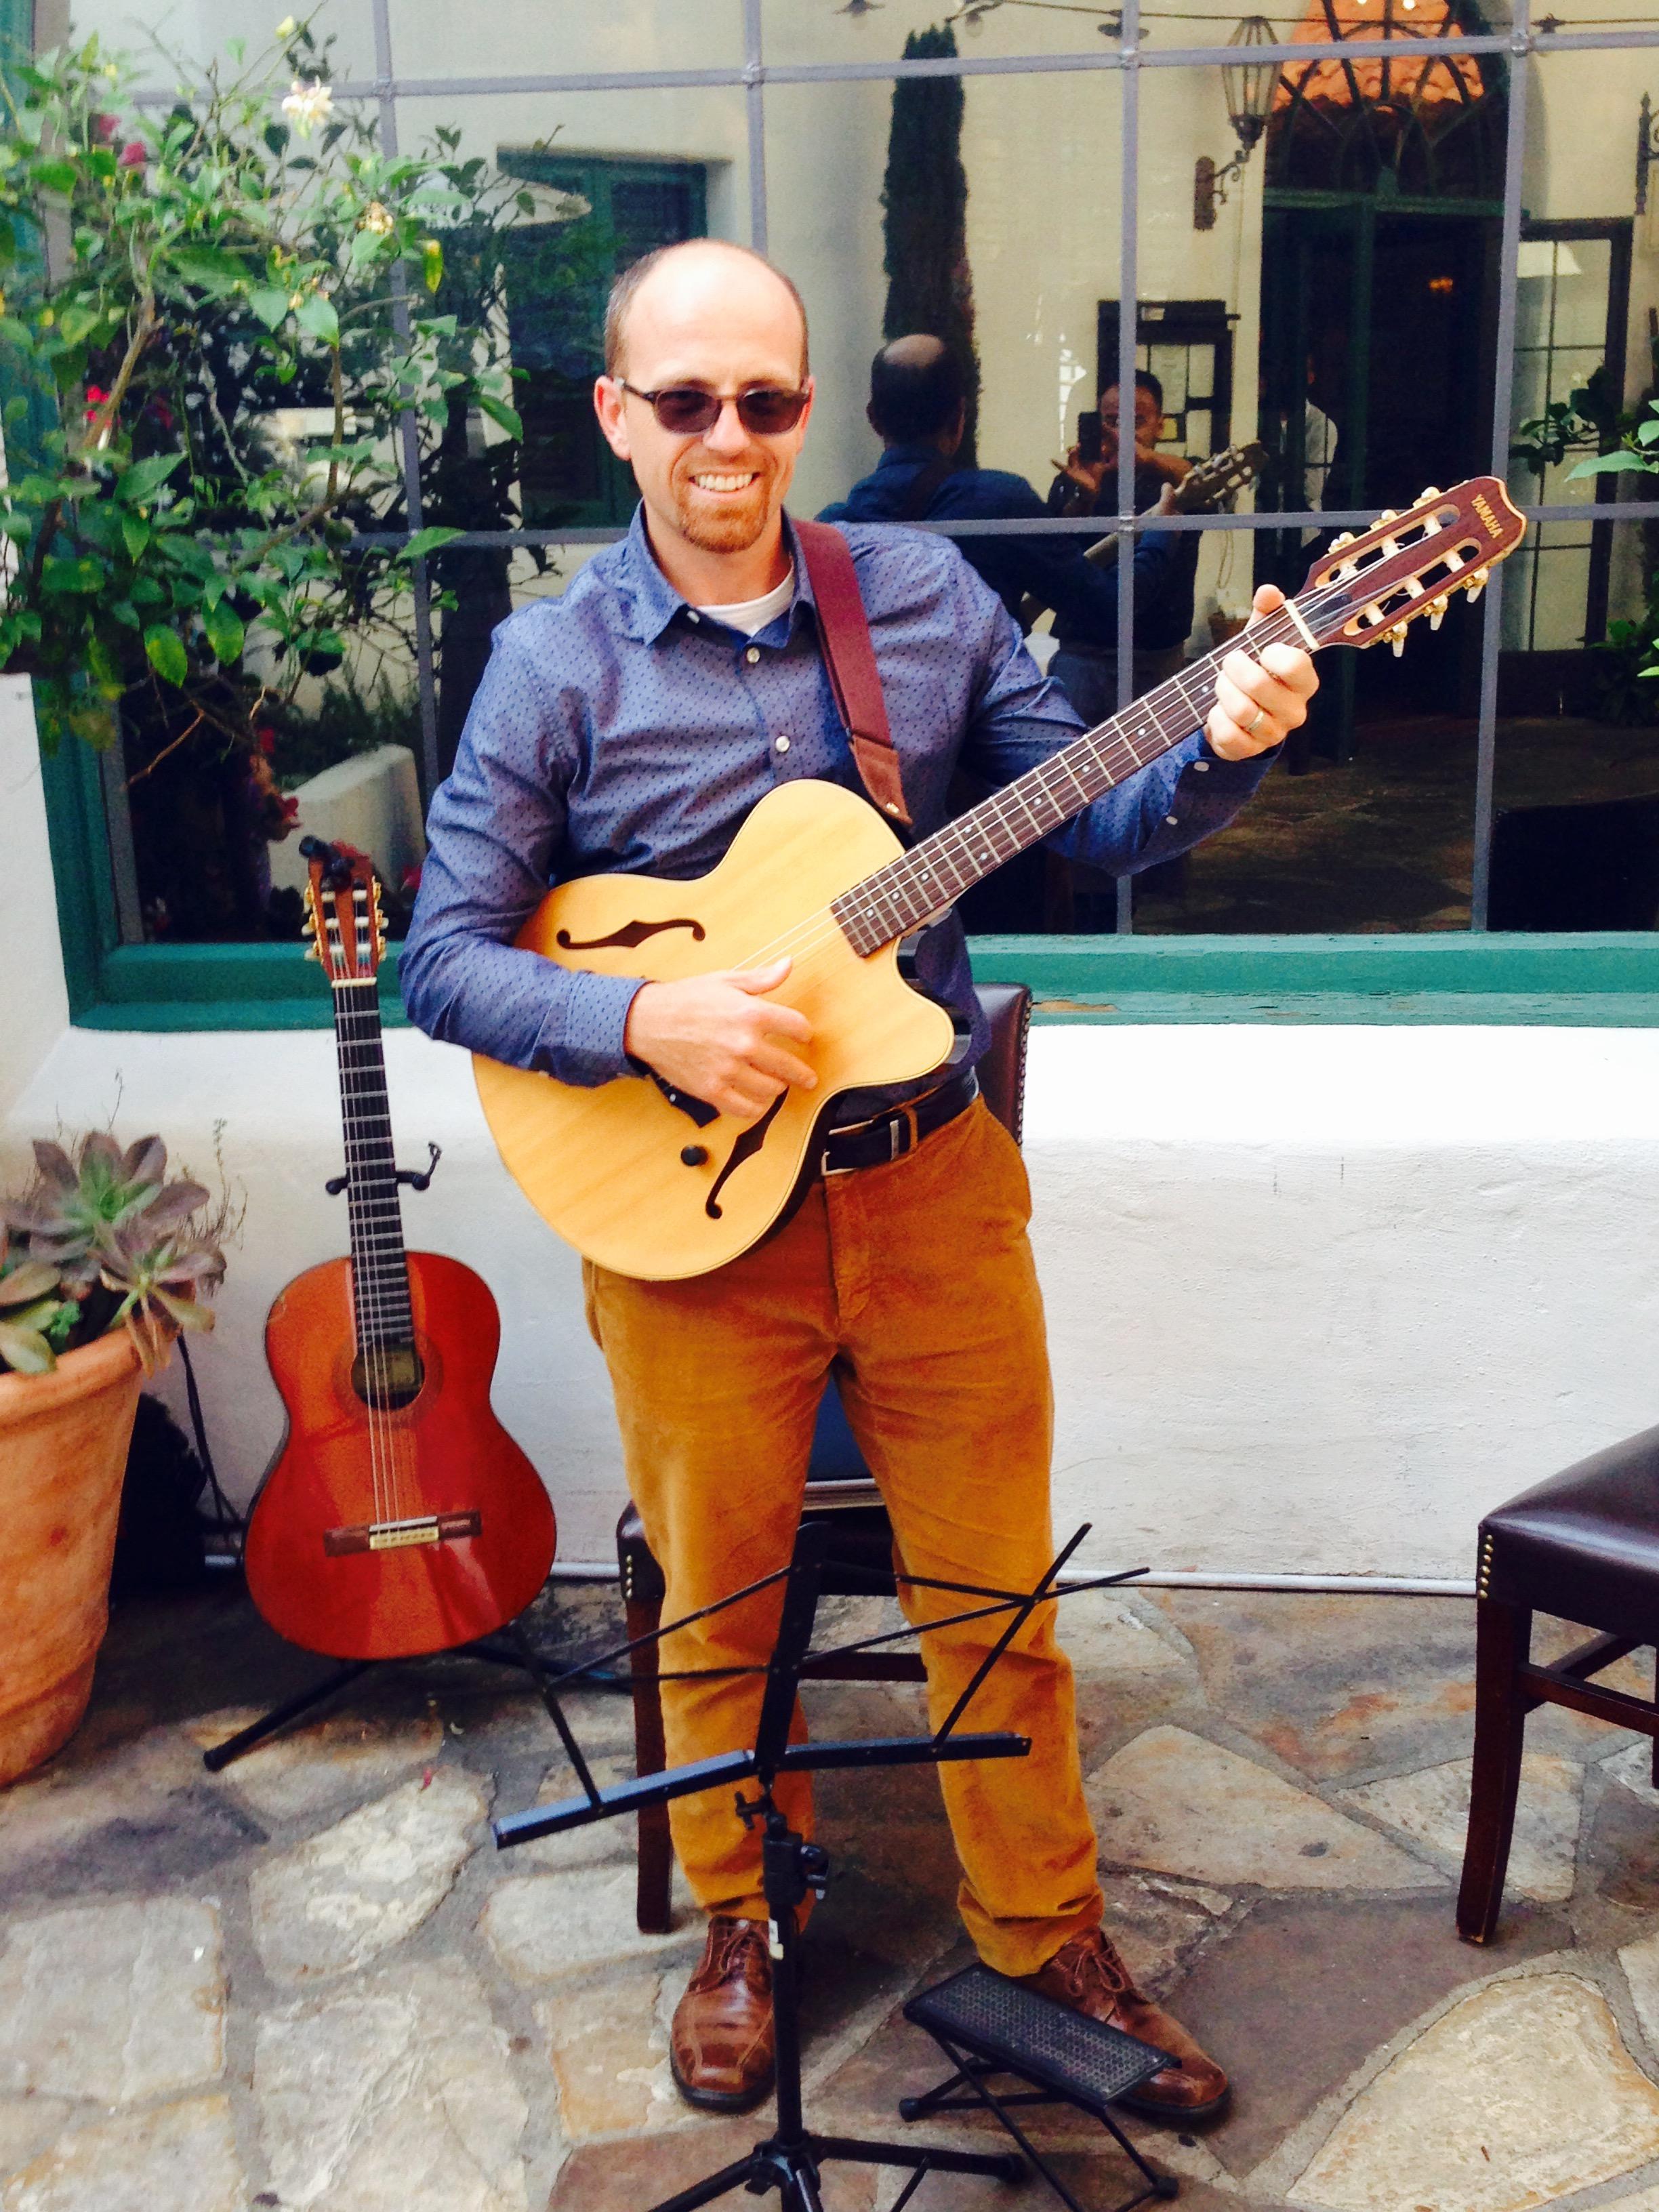 Michael Witt of Santa Barbara Guitar Collective (SBGC - duo performance) at Wine Cask Courtyard